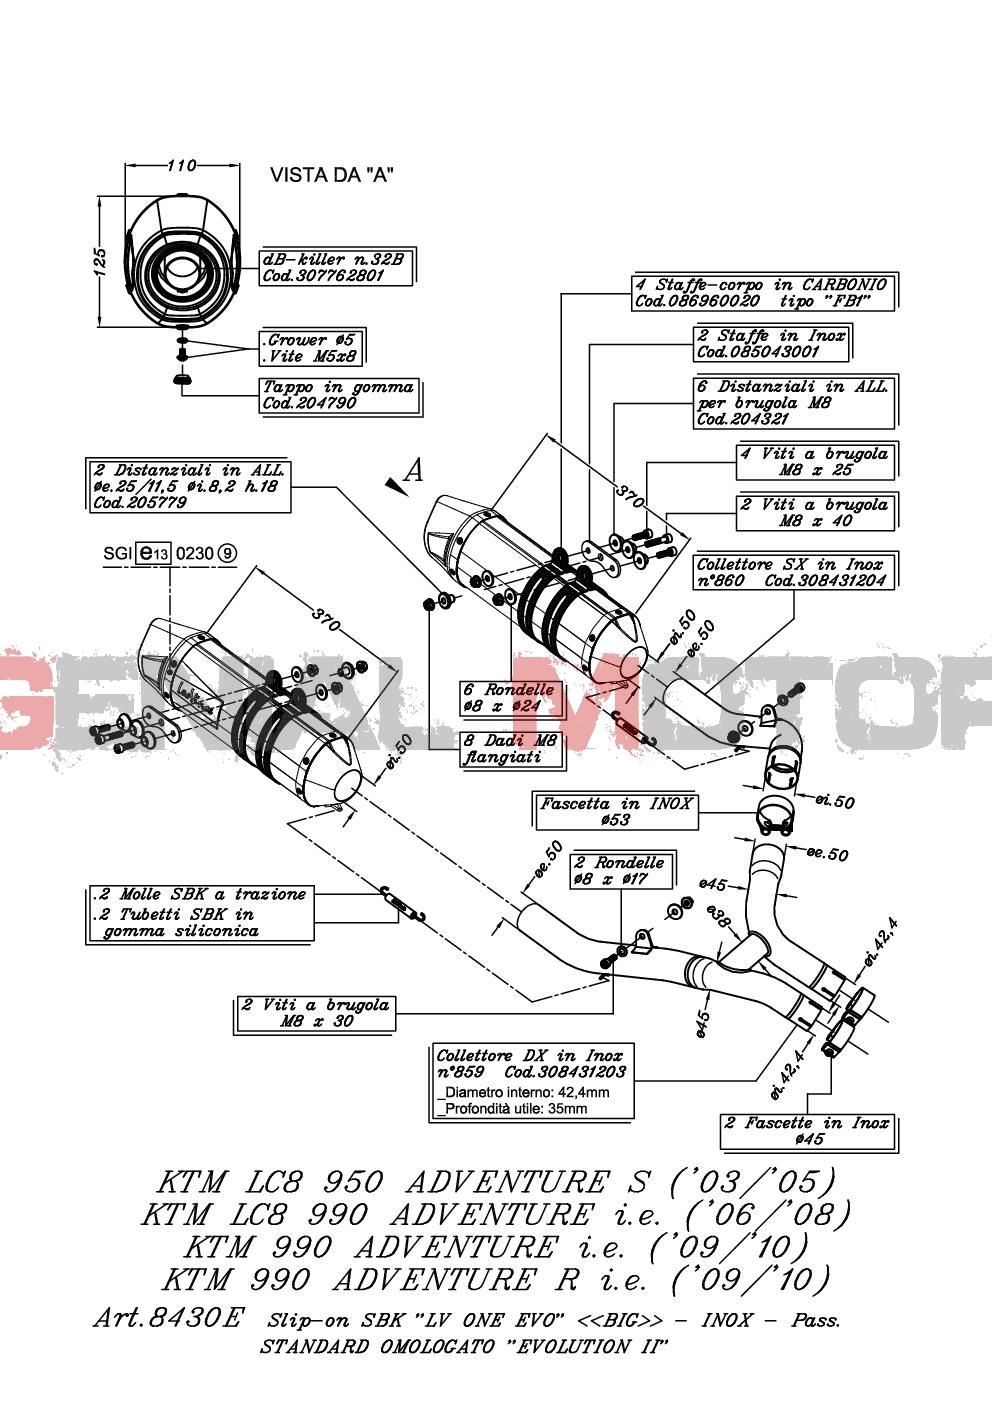 8430E 2 Terminali Scarico Leovince Lv One Evo Acc Ktm 950 Lc8 Adventure S 2003 > 2005